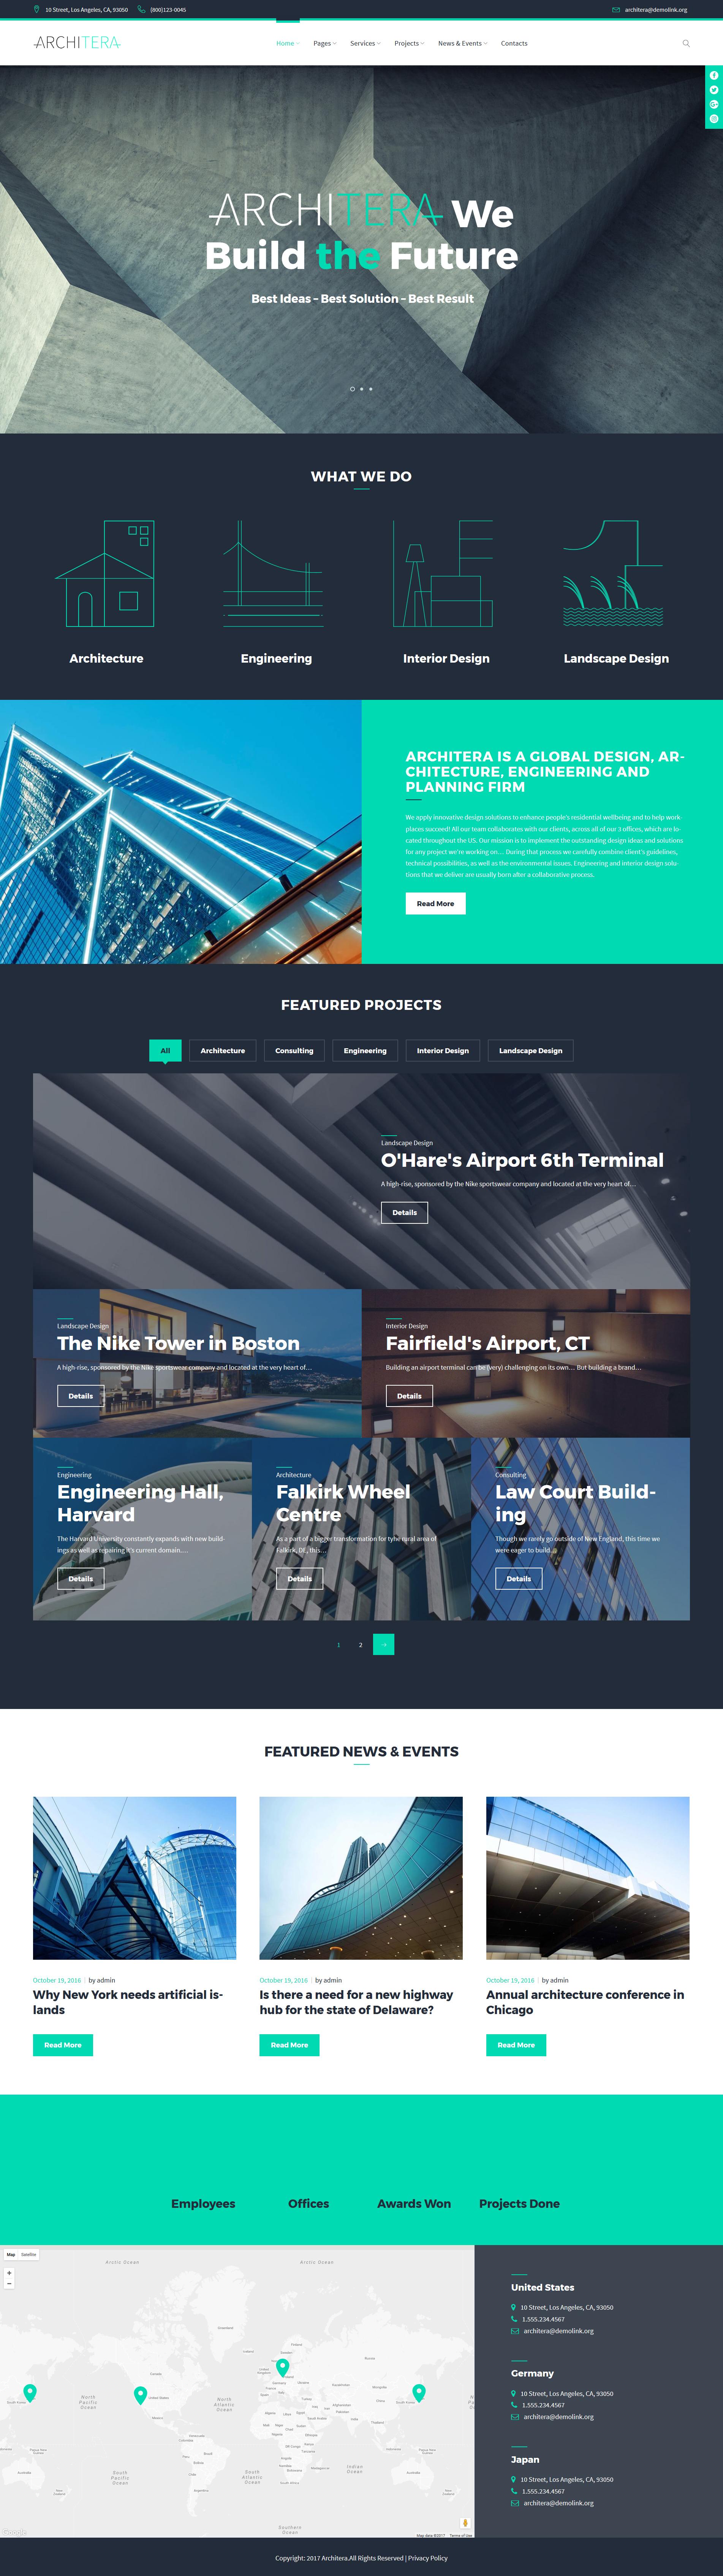 Architera - Architecture Firm Responsive №63498 - скриншот